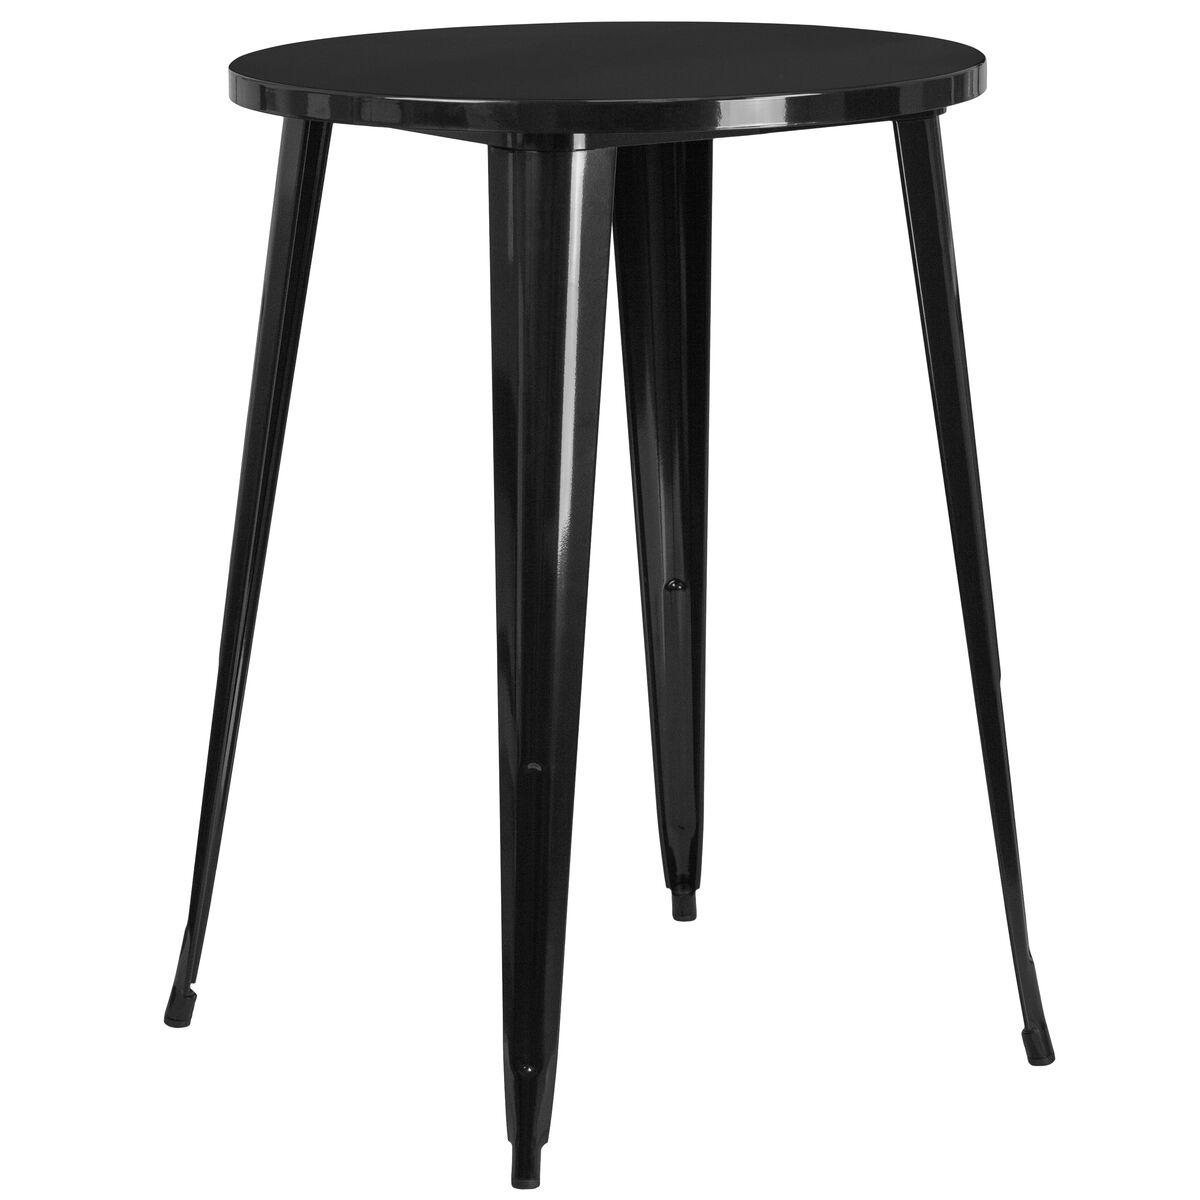 Sensational Commercial Grade 30 Round Black Metal Indoor Outdoor Bar Table Set With 2 Cafe Stools Forskolin Free Trial Chair Design Images Forskolin Free Trialorg